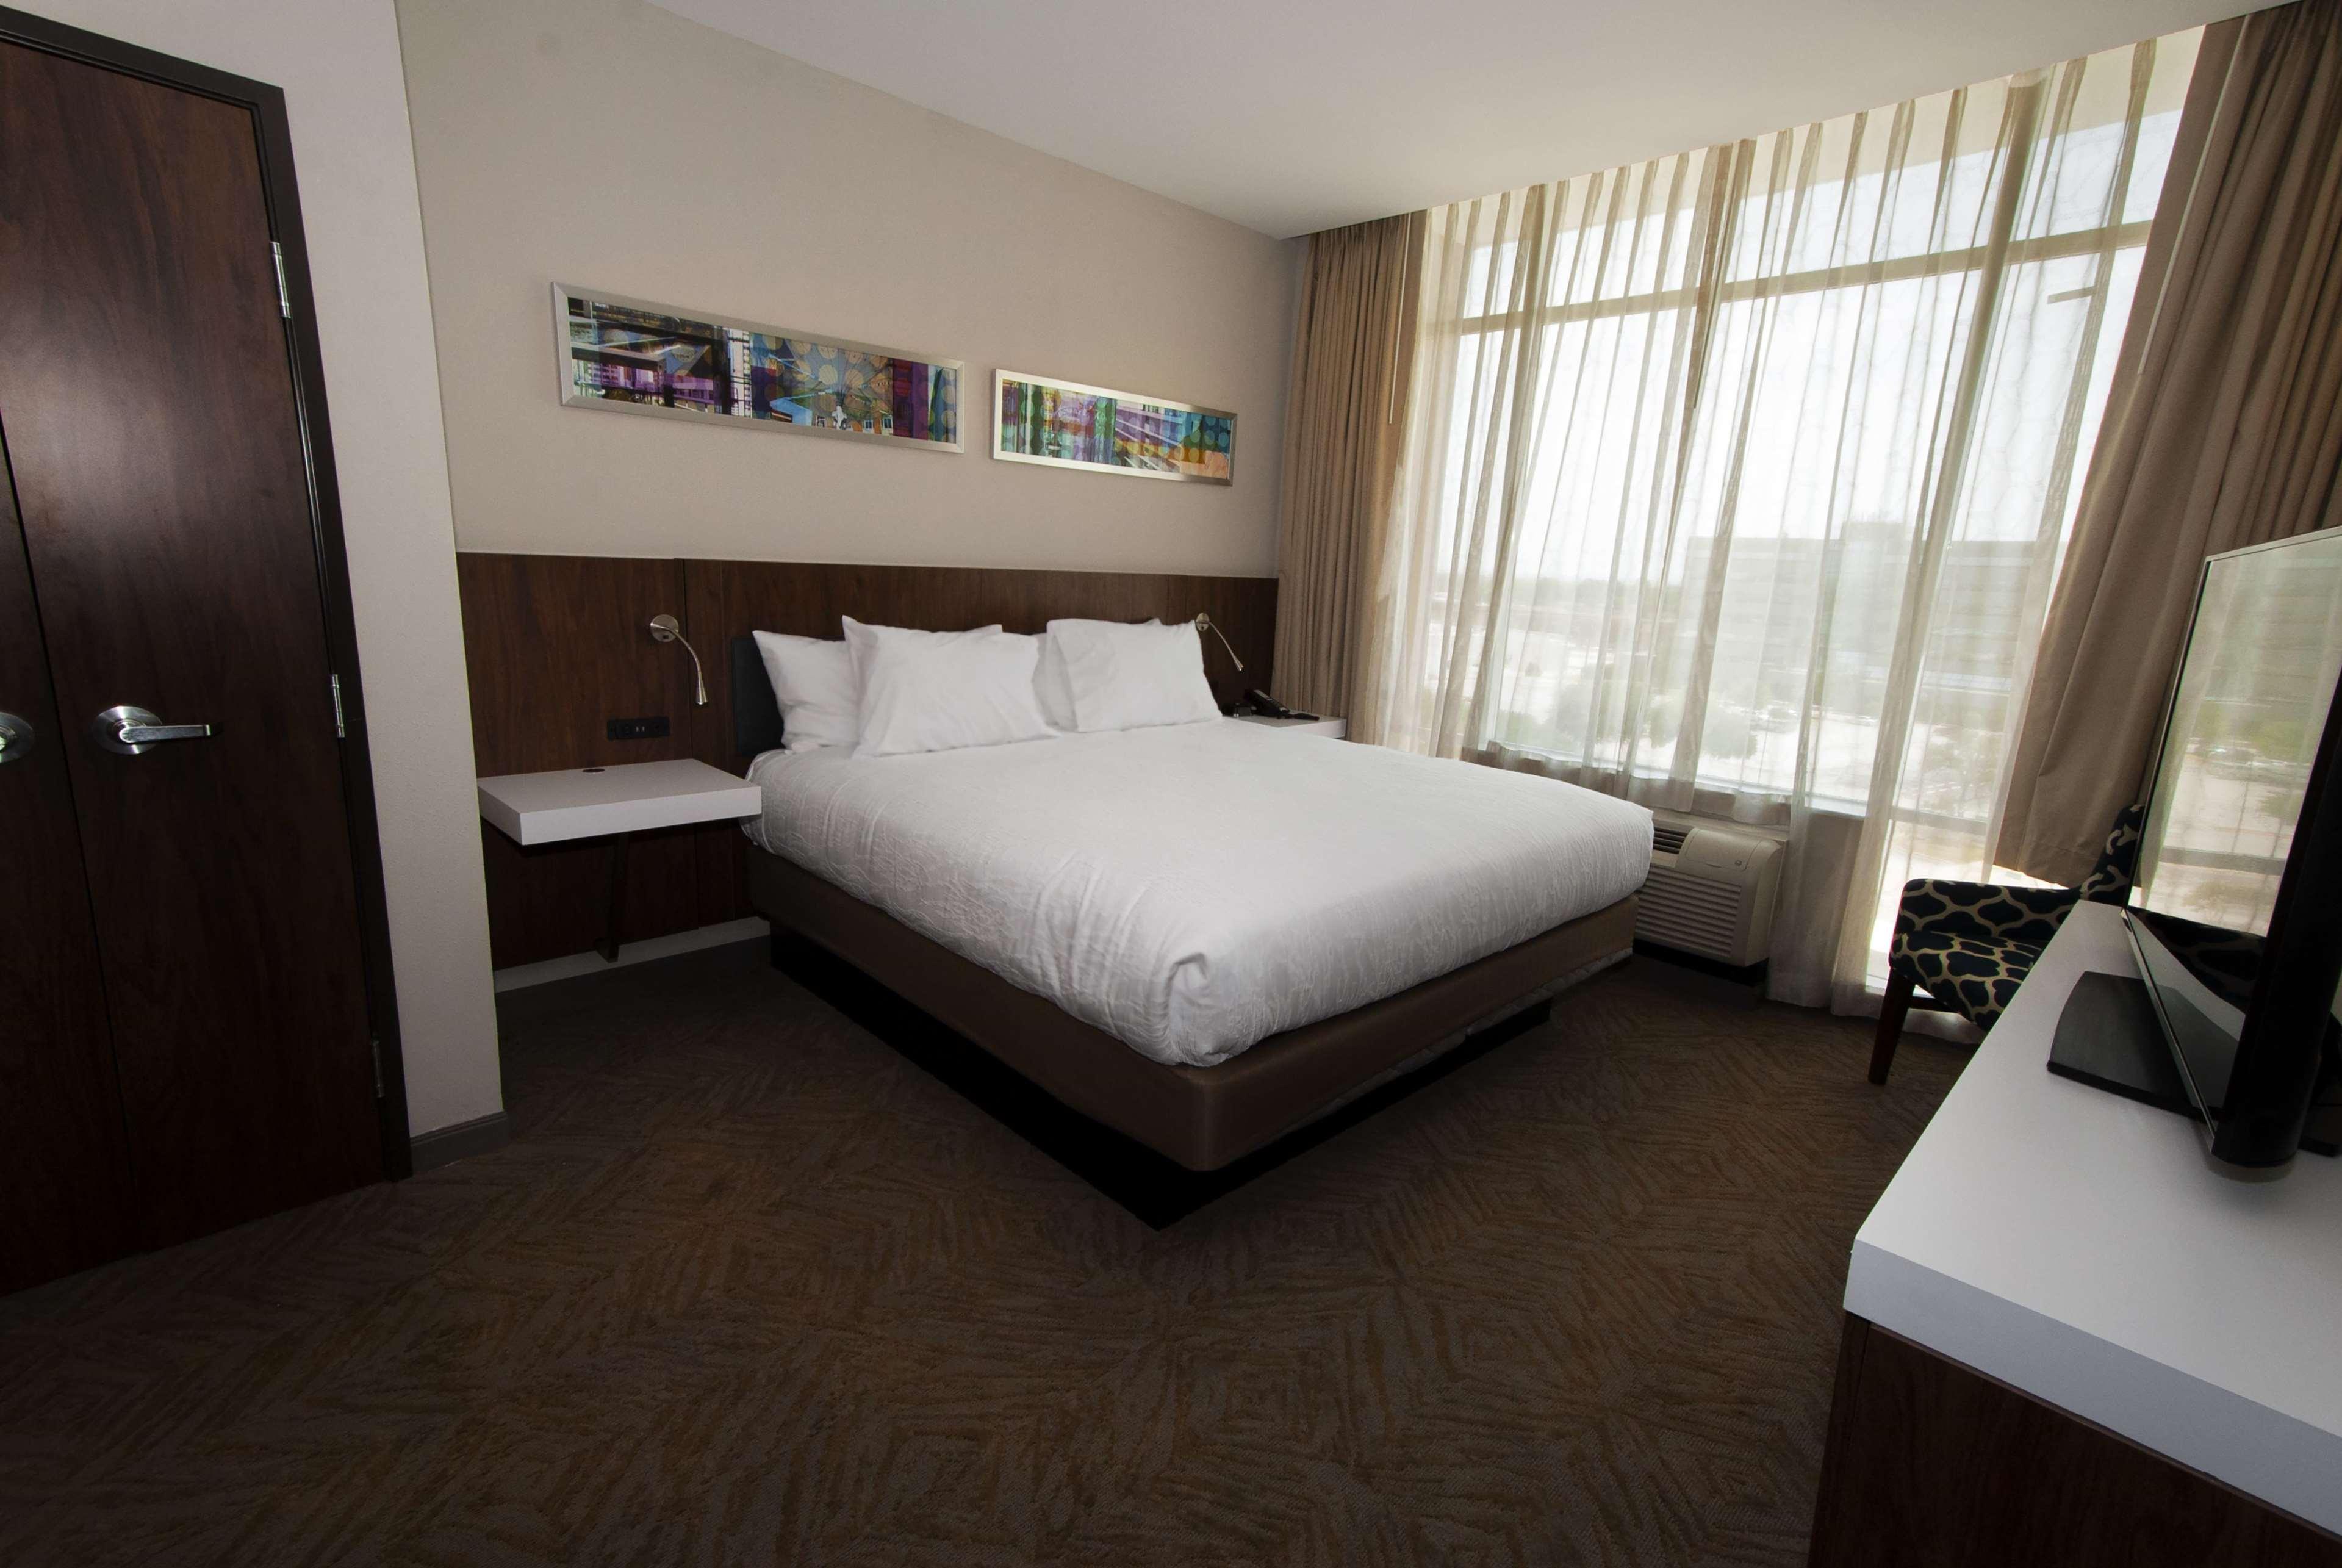 Hilton Garden Inn Dallas at Hurst Conference Center image 43